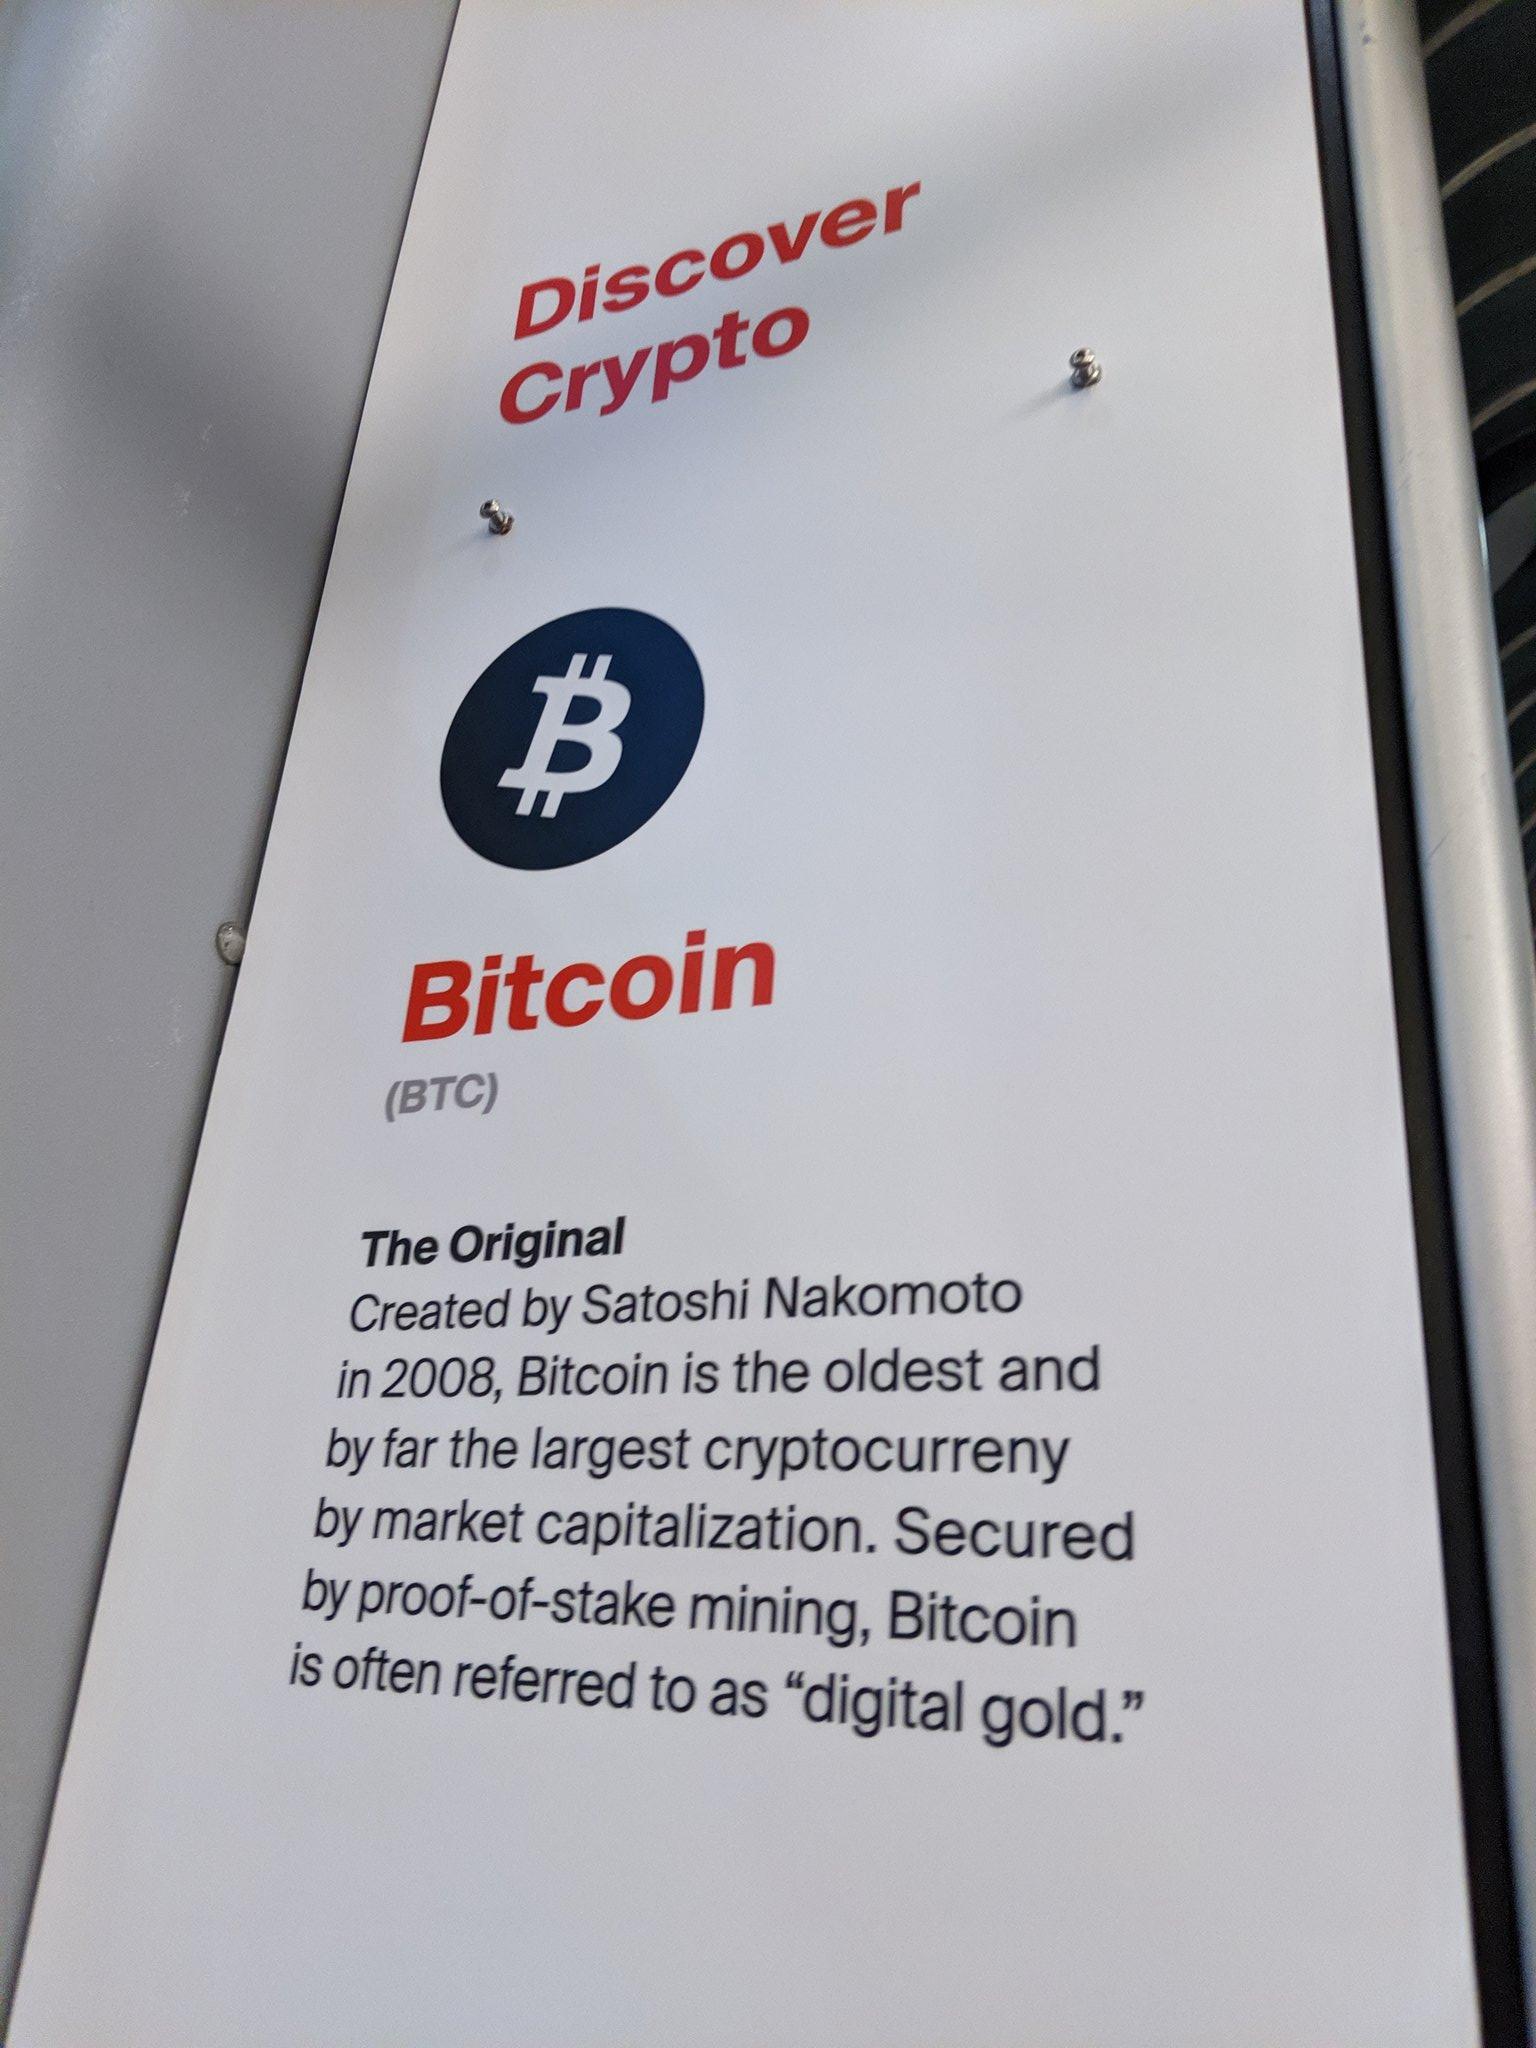 Tramming mining bitcoins best spread betting sites ukc